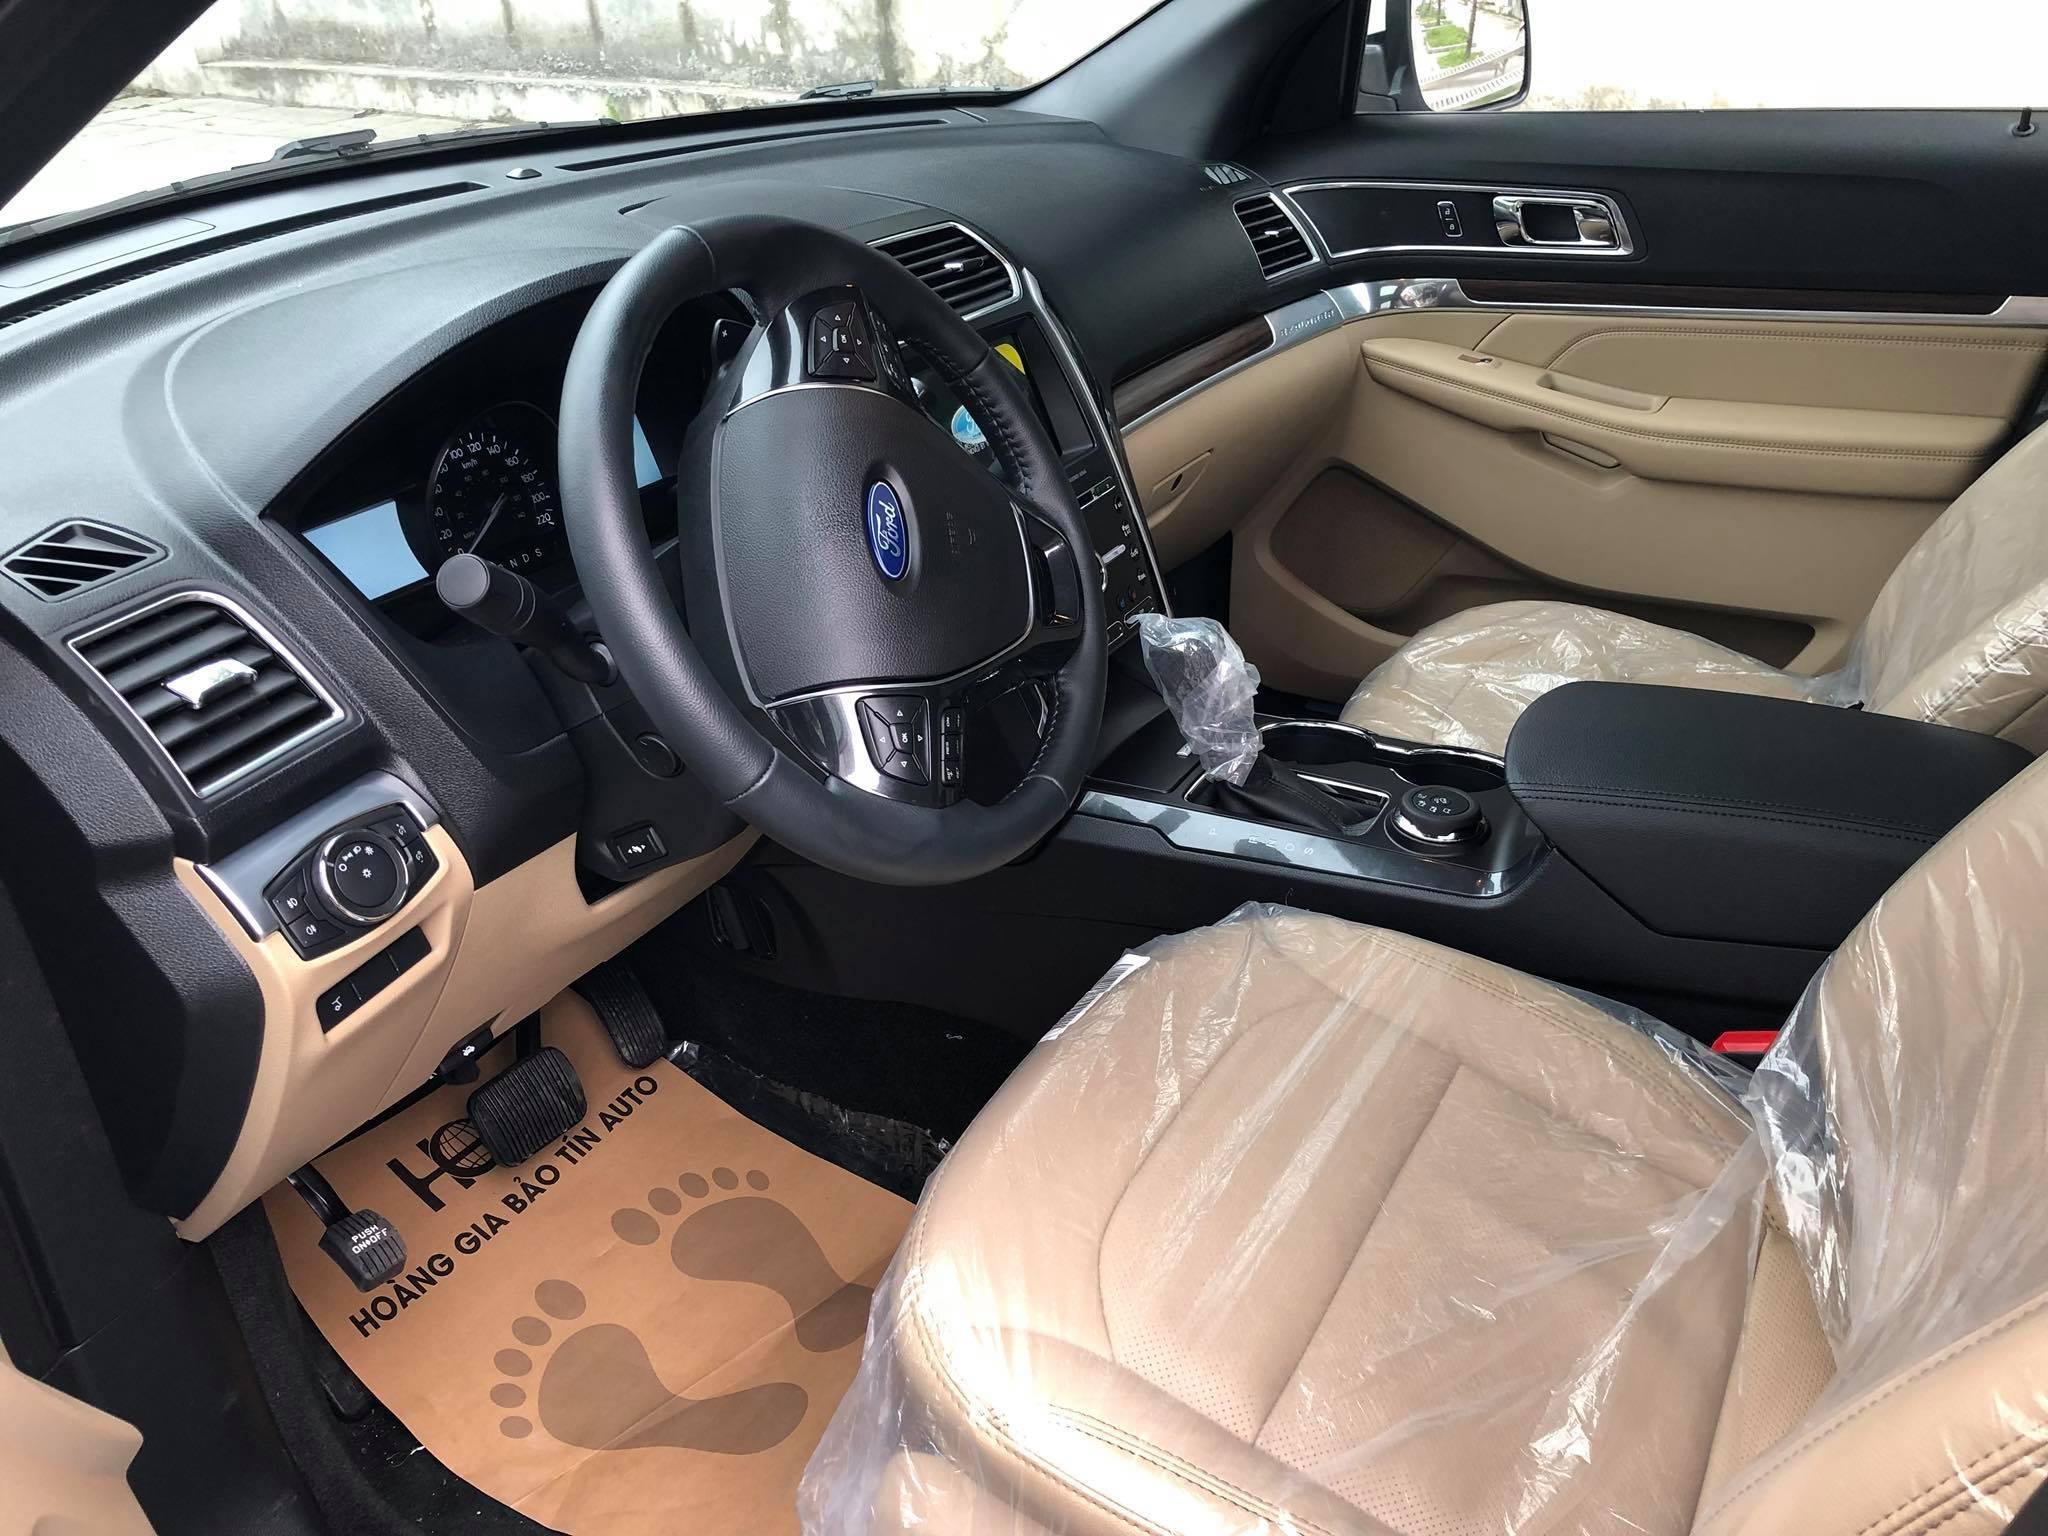 Ford Explorer 2018 15A-083.xx